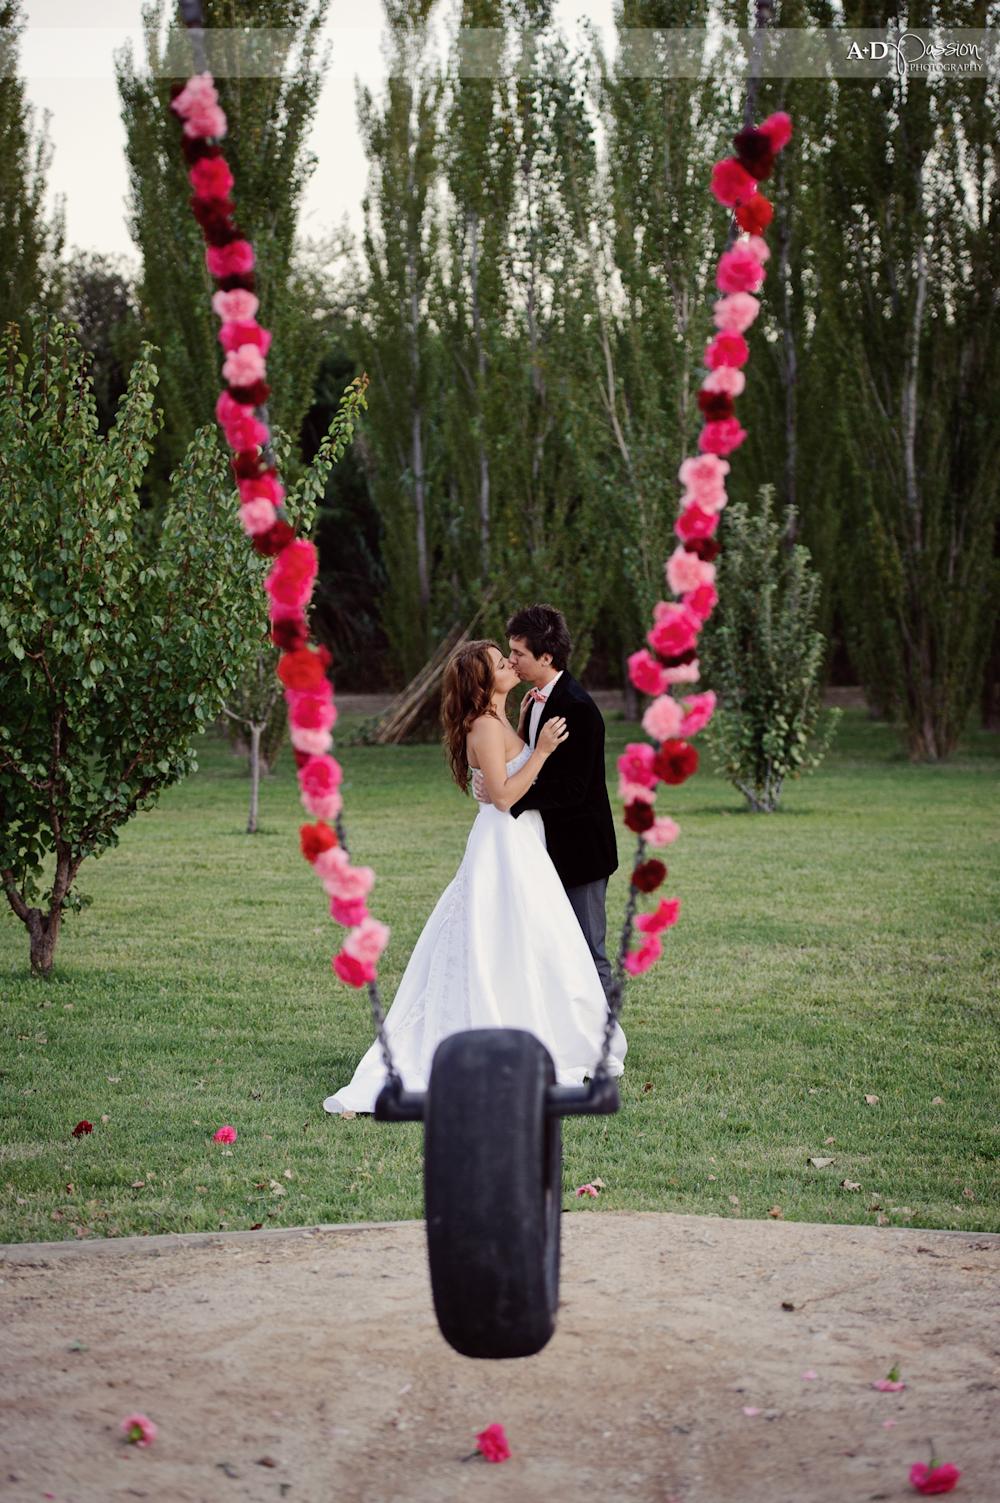 AD Passion Photography | 20120931_Cristi&Raluca_Fotograf-profesionist-nunta_After-Wedding-Zaragoza-Spania_0024 | Adelin, Dida, fotograf profesionist, fotograf de nunta, fotografie de nunta, fotograf Timisoara, fotograf Craiova, fotograf Bucuresti, fotograf Arad, nunta Timisoara, nunta Arad, nunta Bucuresti, nunta Craiova